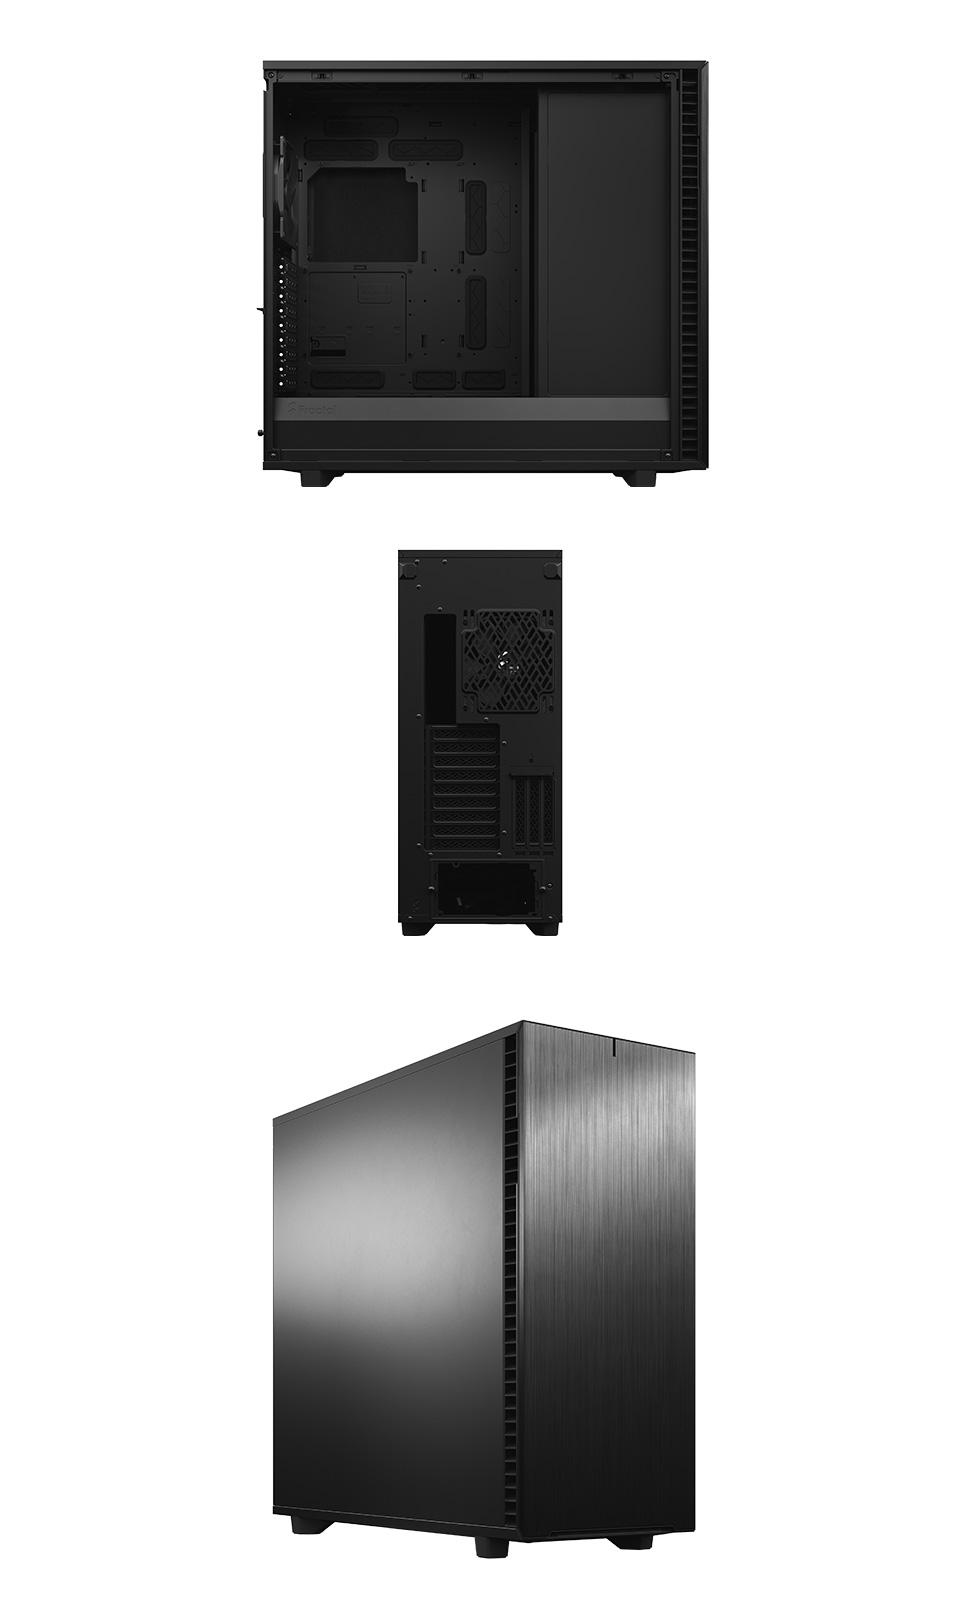 Fractal Design Define 7 XL Closed Black product